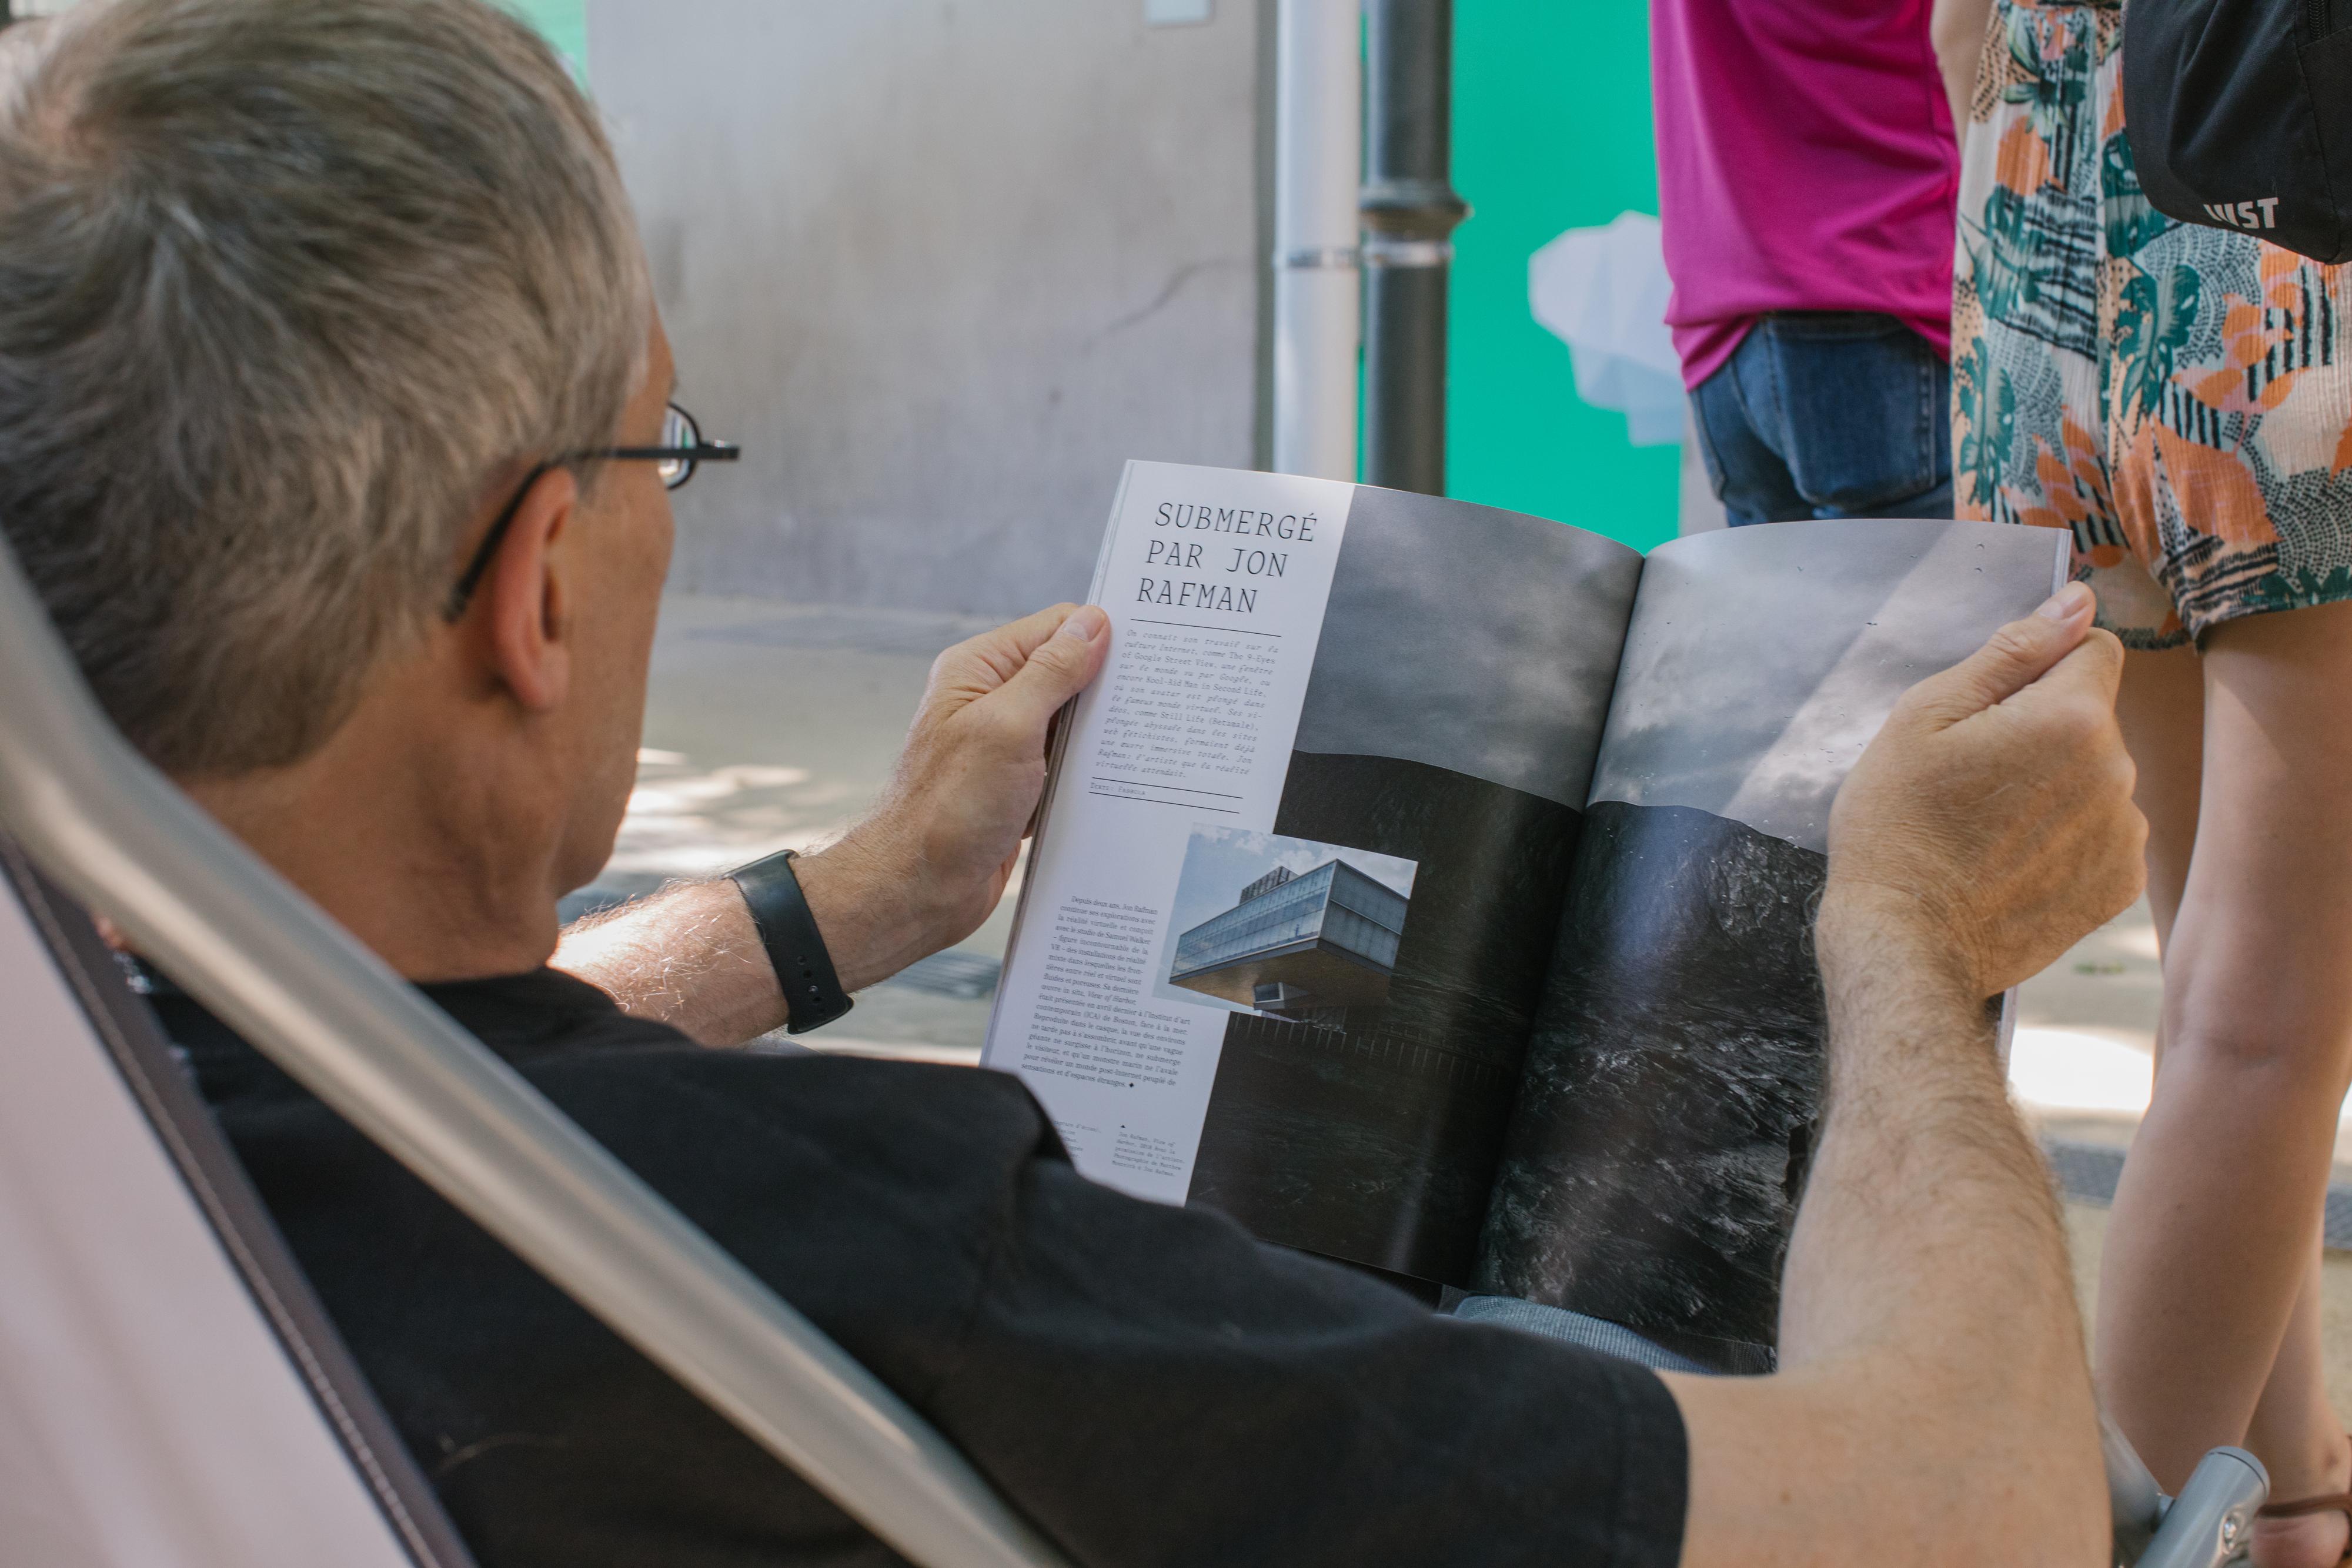 VR Arles Festival 2018 - Curation by Fabbula - Fabbula